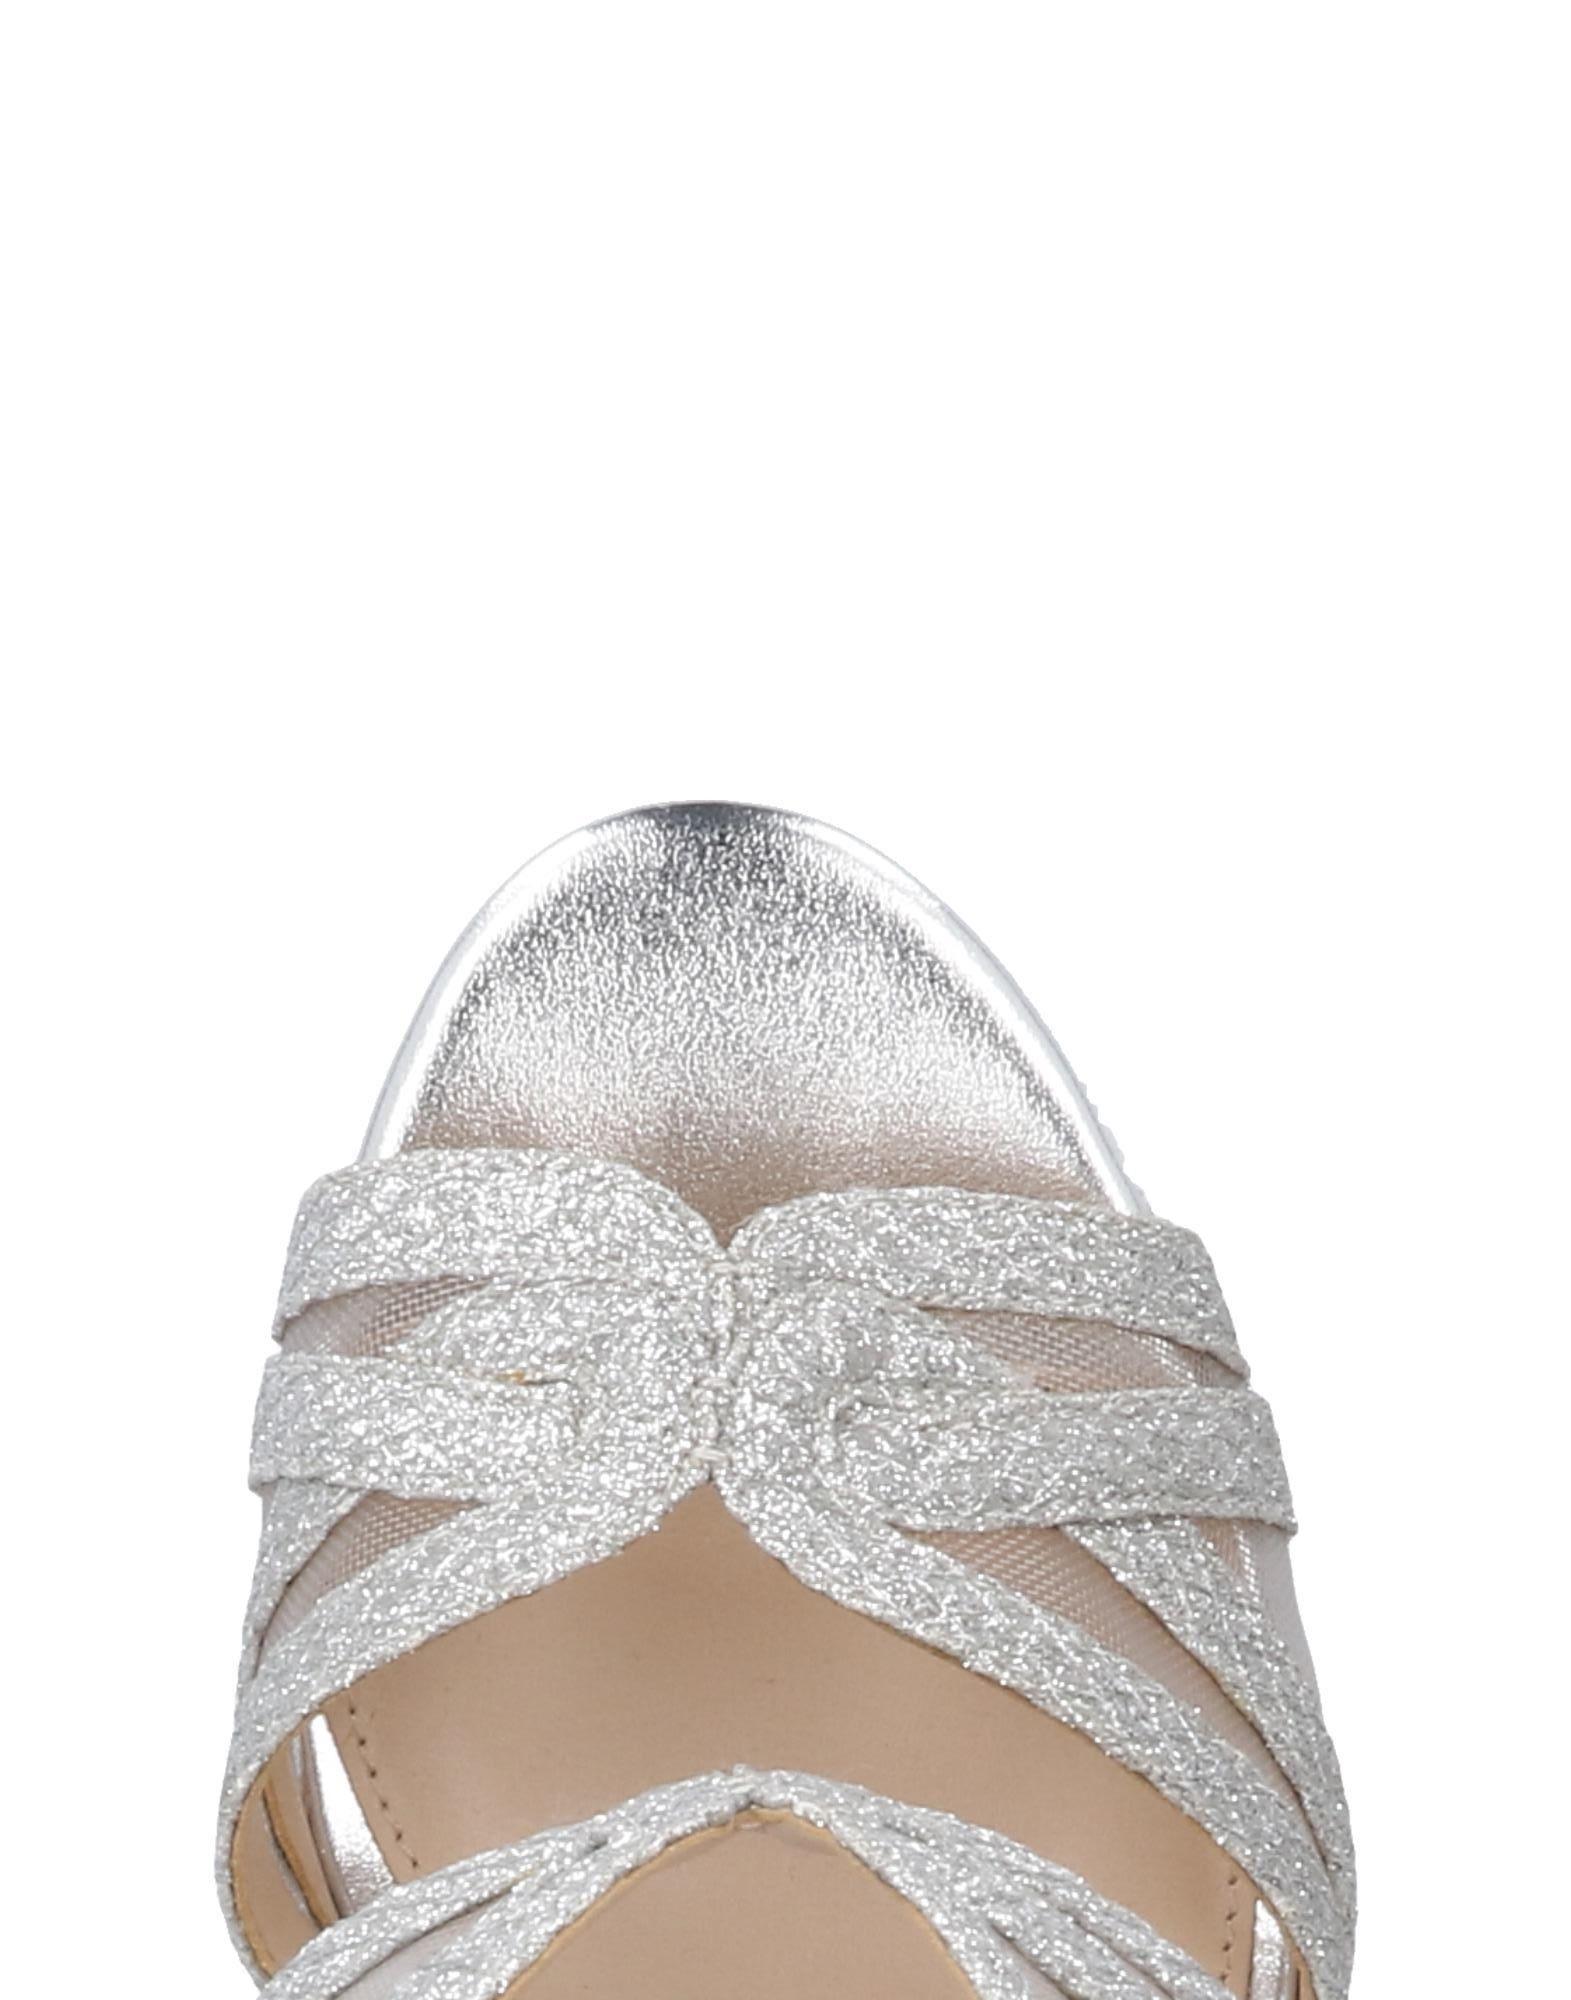 Nina New York Qualität Sandalen Damen  11479297MI Gute Qualität York beliebte Schuhe f23a58